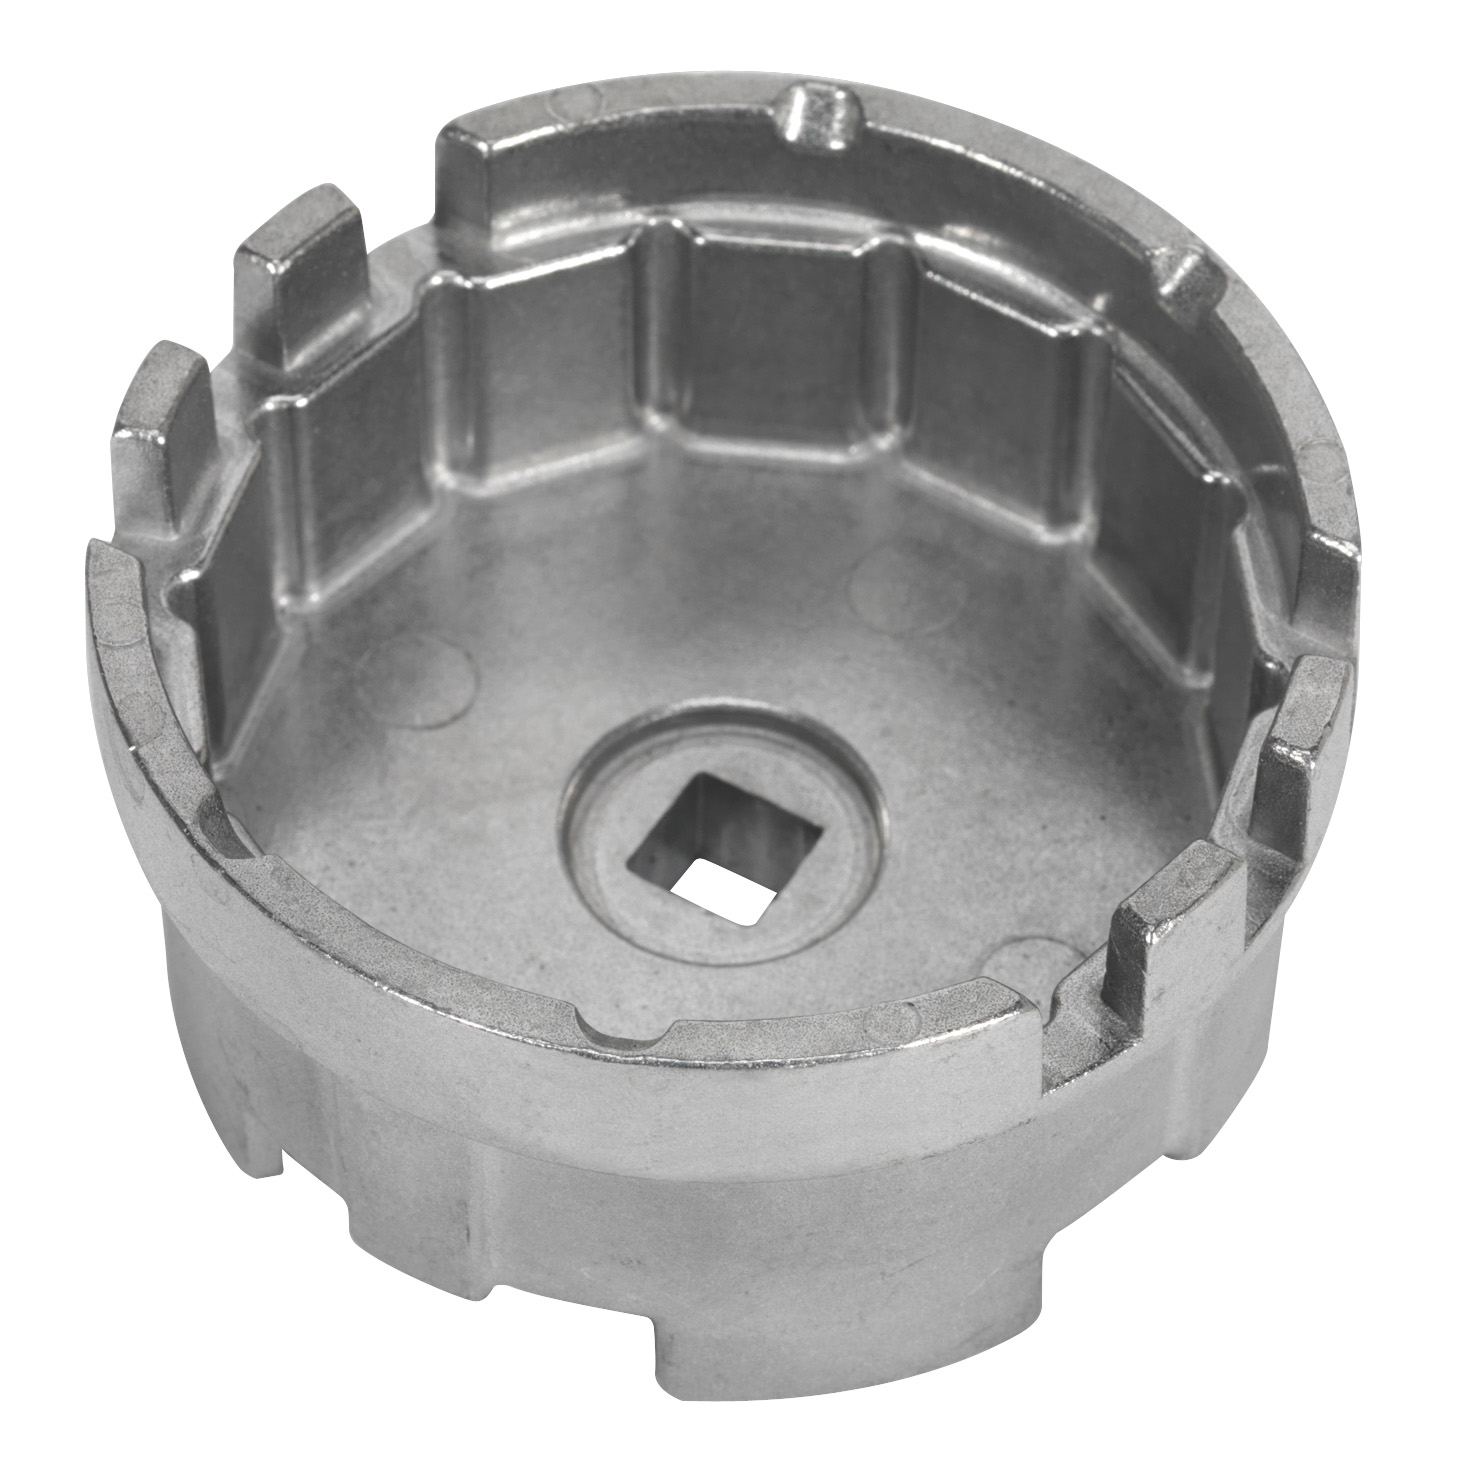 Sealey VS7111 Oil Filter Cap Wrench 64.5mm X 14 Flutes Toyota Garage Workshop